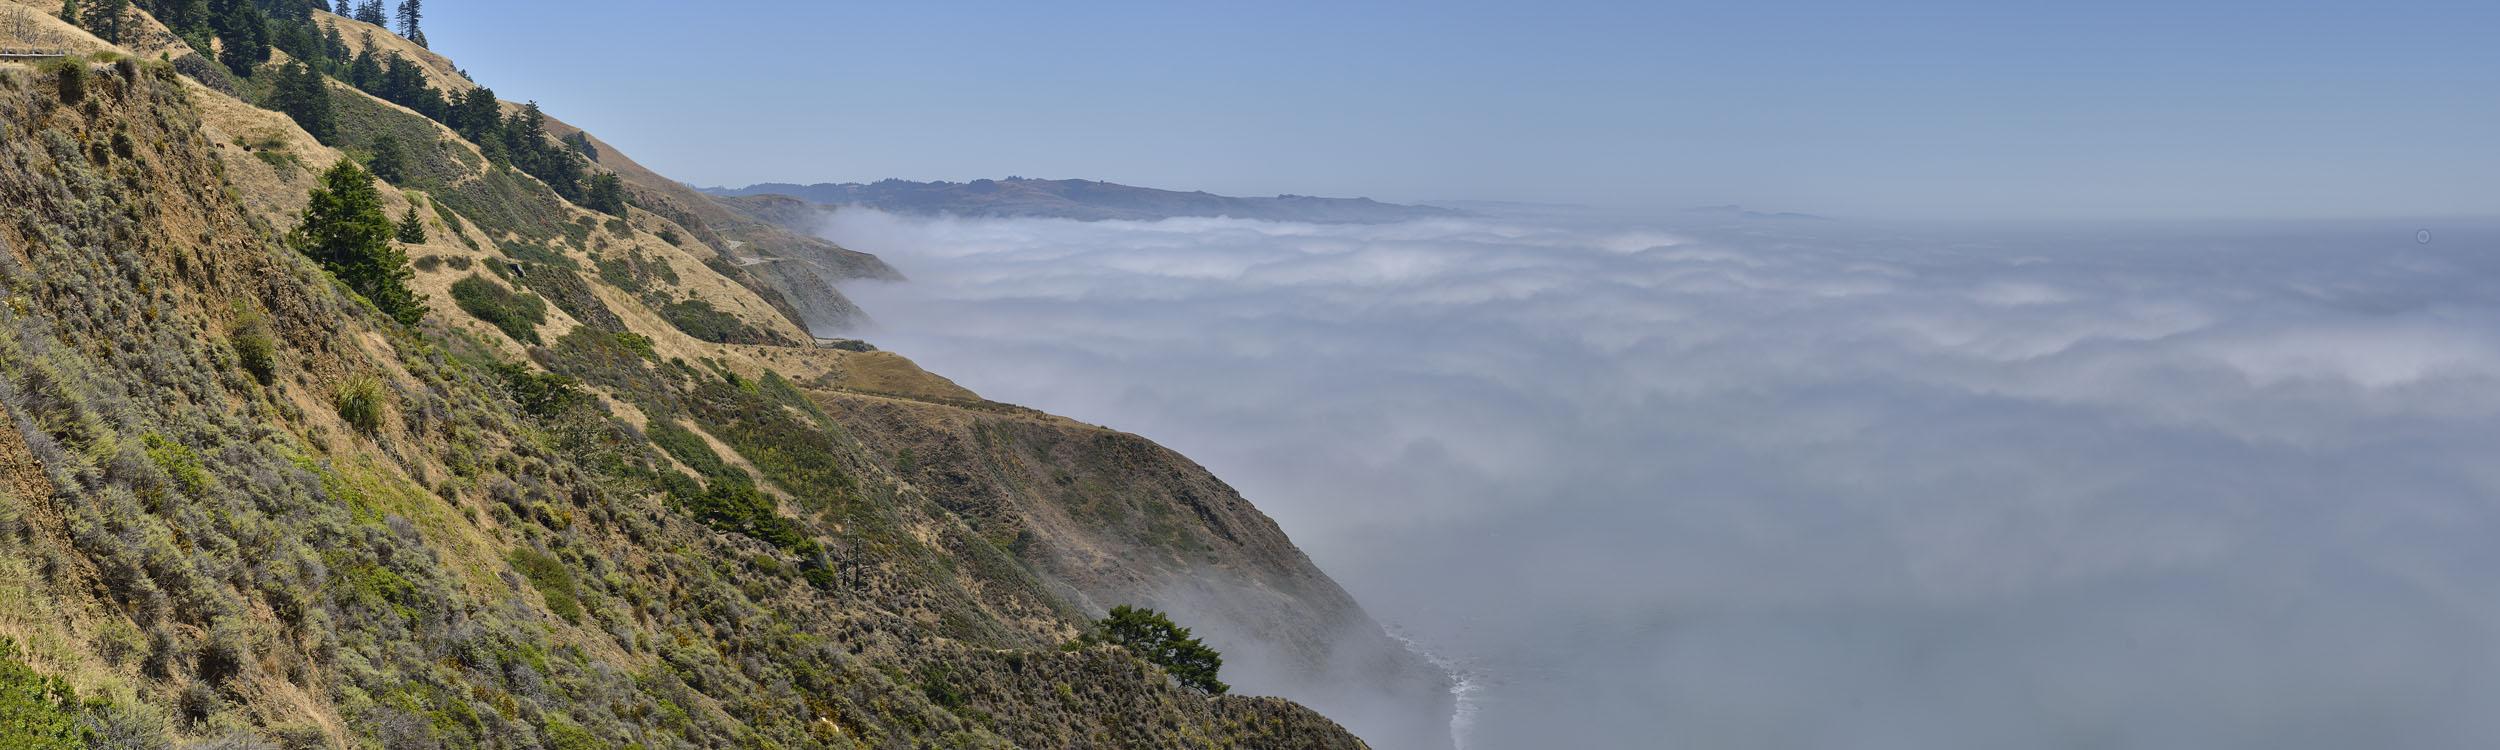 Foggy Morning on Coastal Highway, CA